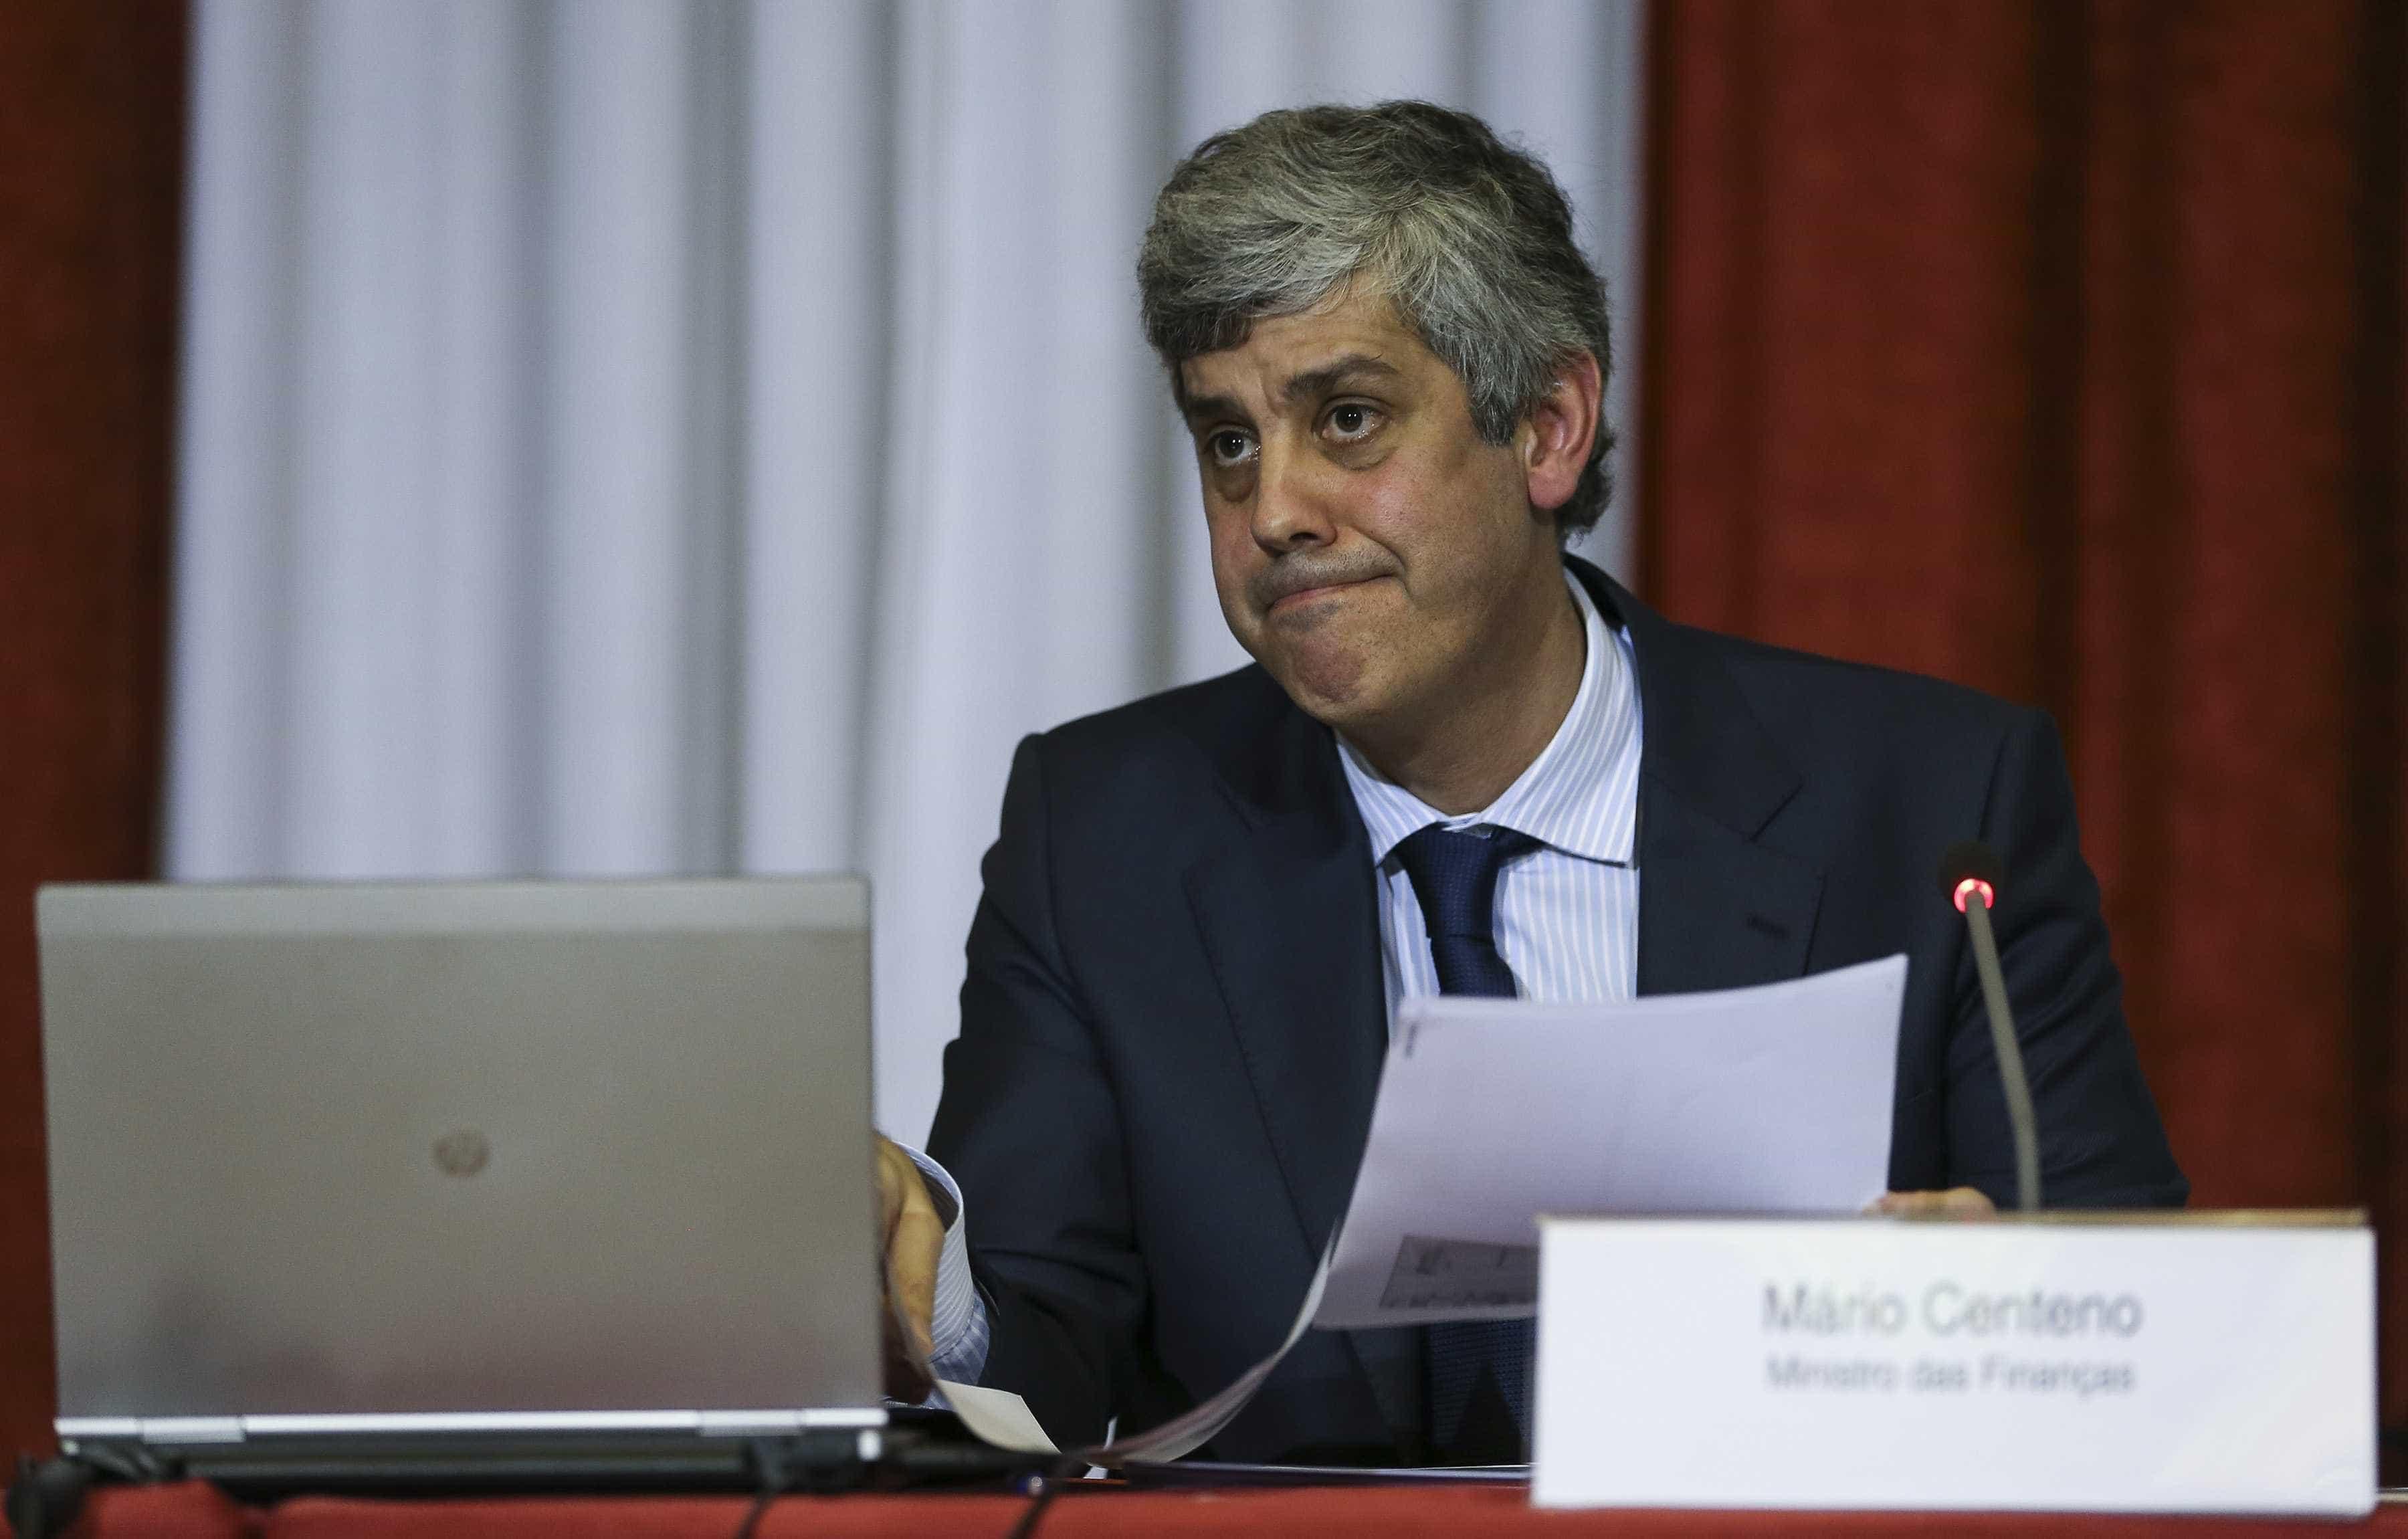 Centeno apresenta Programa de Estabilidade 2019-2023 às 12h00